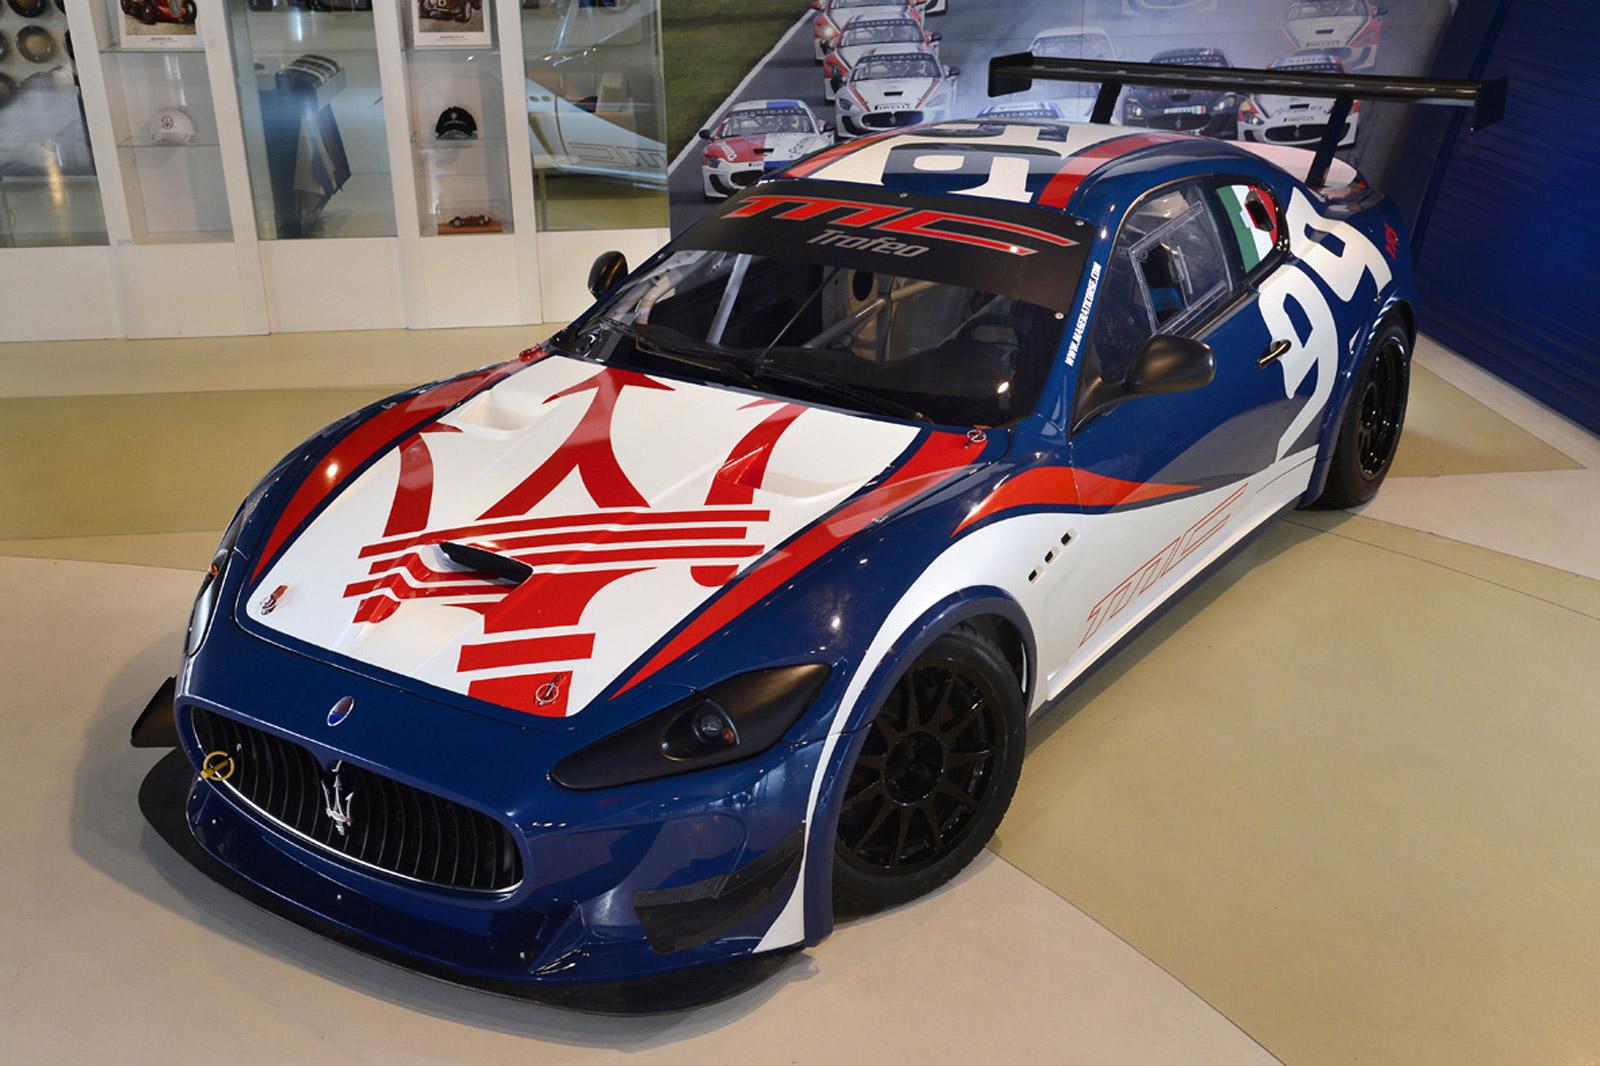 2013 Maserati Granturismo Mc Trofeo Race Car Revealed